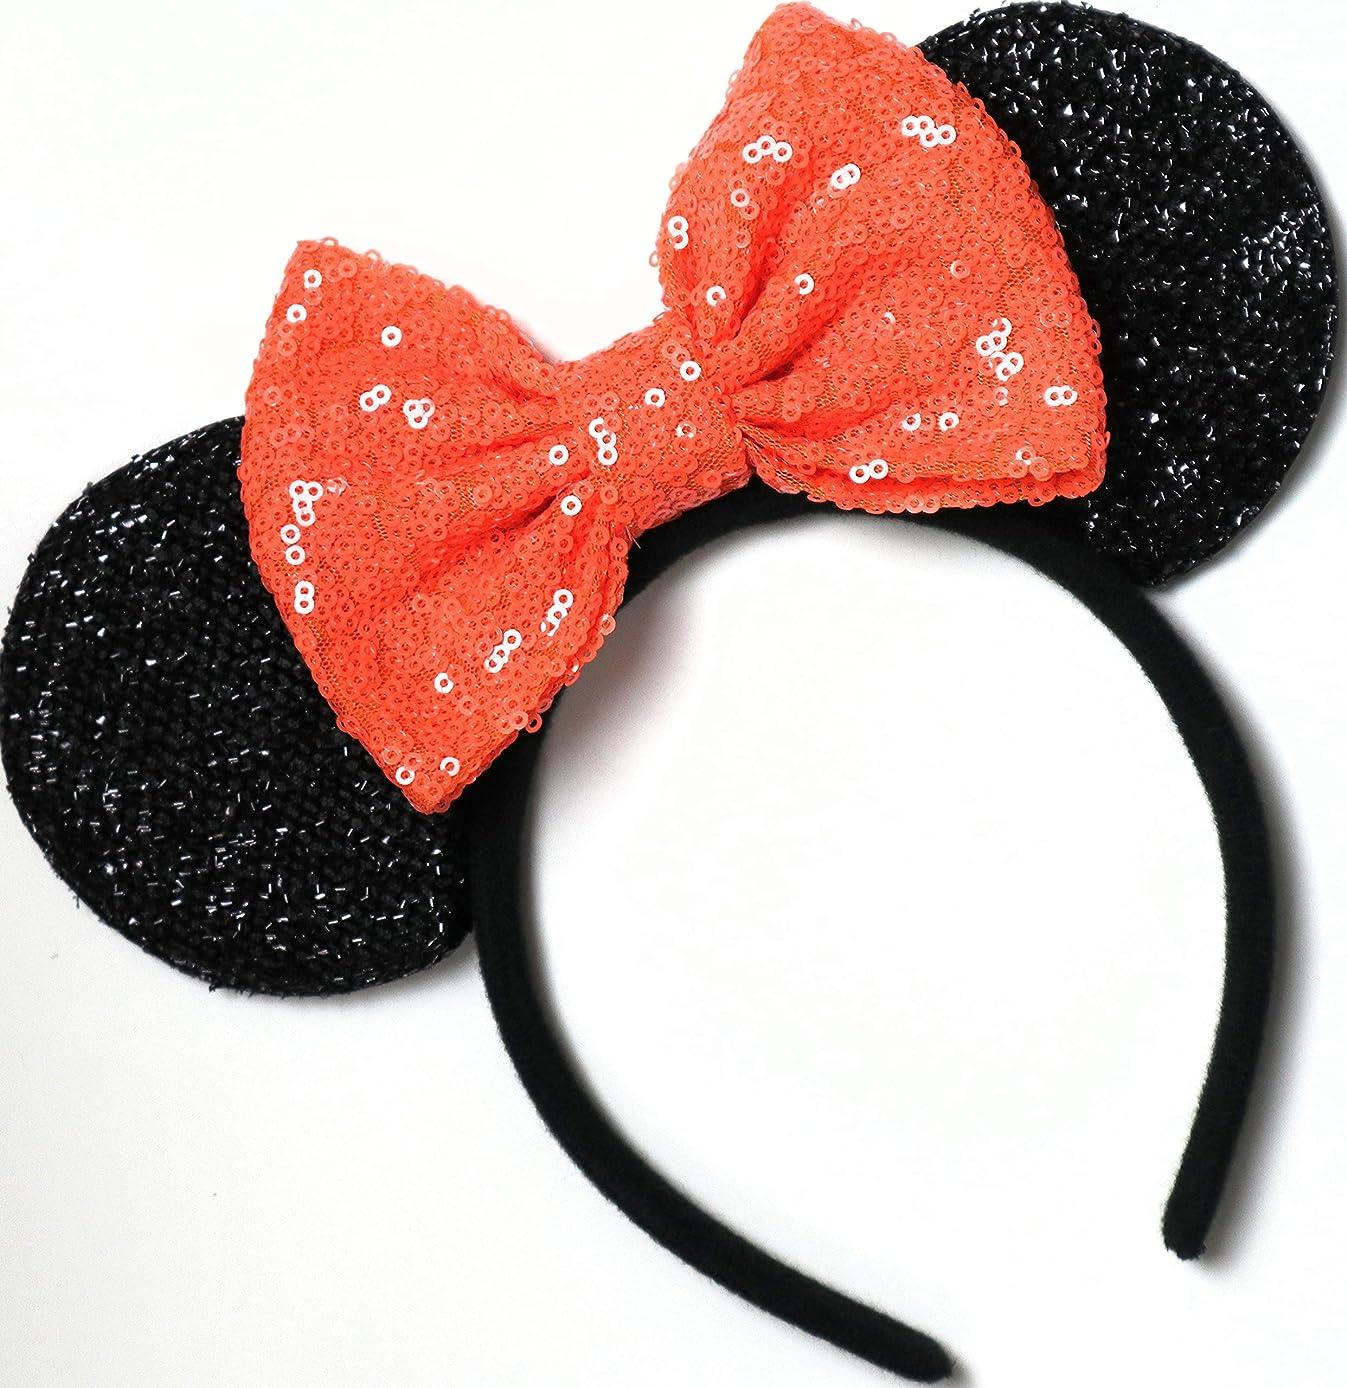 Halloween Orange Mickey Ears, Halloween Orange Minnie Ears, Mickey Ears, Halloween Disney Ears, Halloween Minnie Ears,